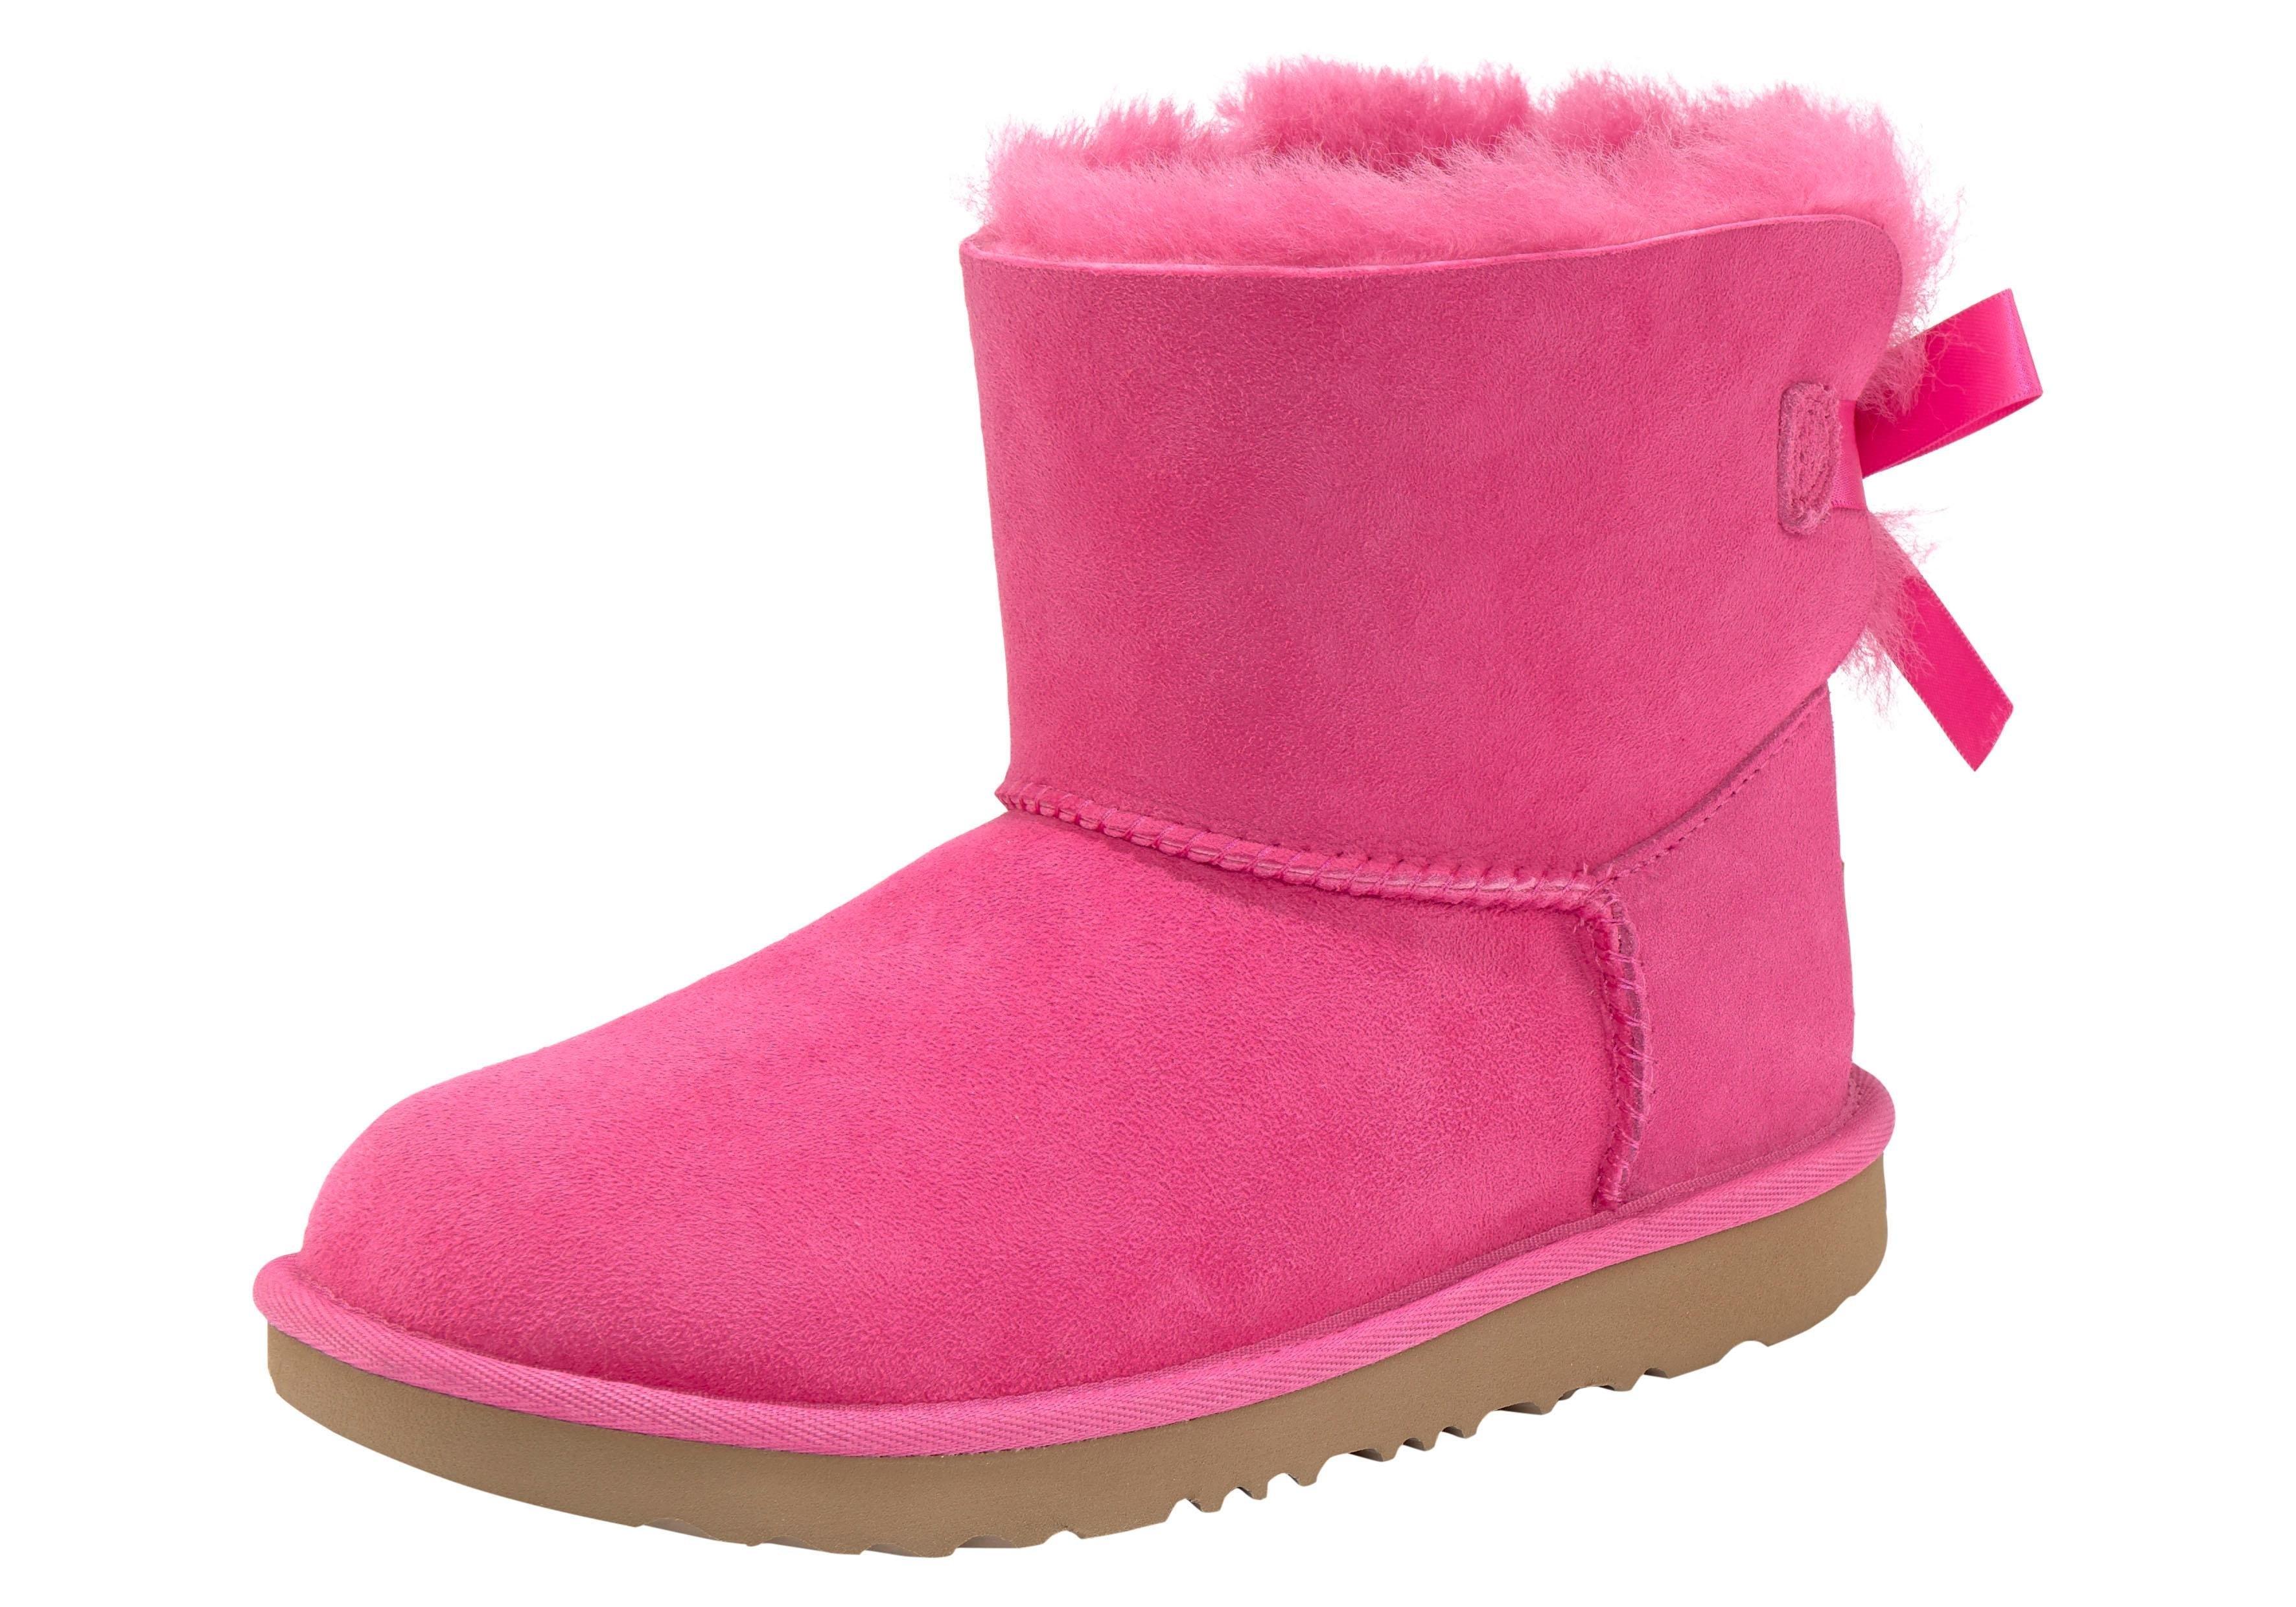 Ugg boots zonder sluiting »Mini Bailey Bow 2« goedkoop op otto.nl kopen